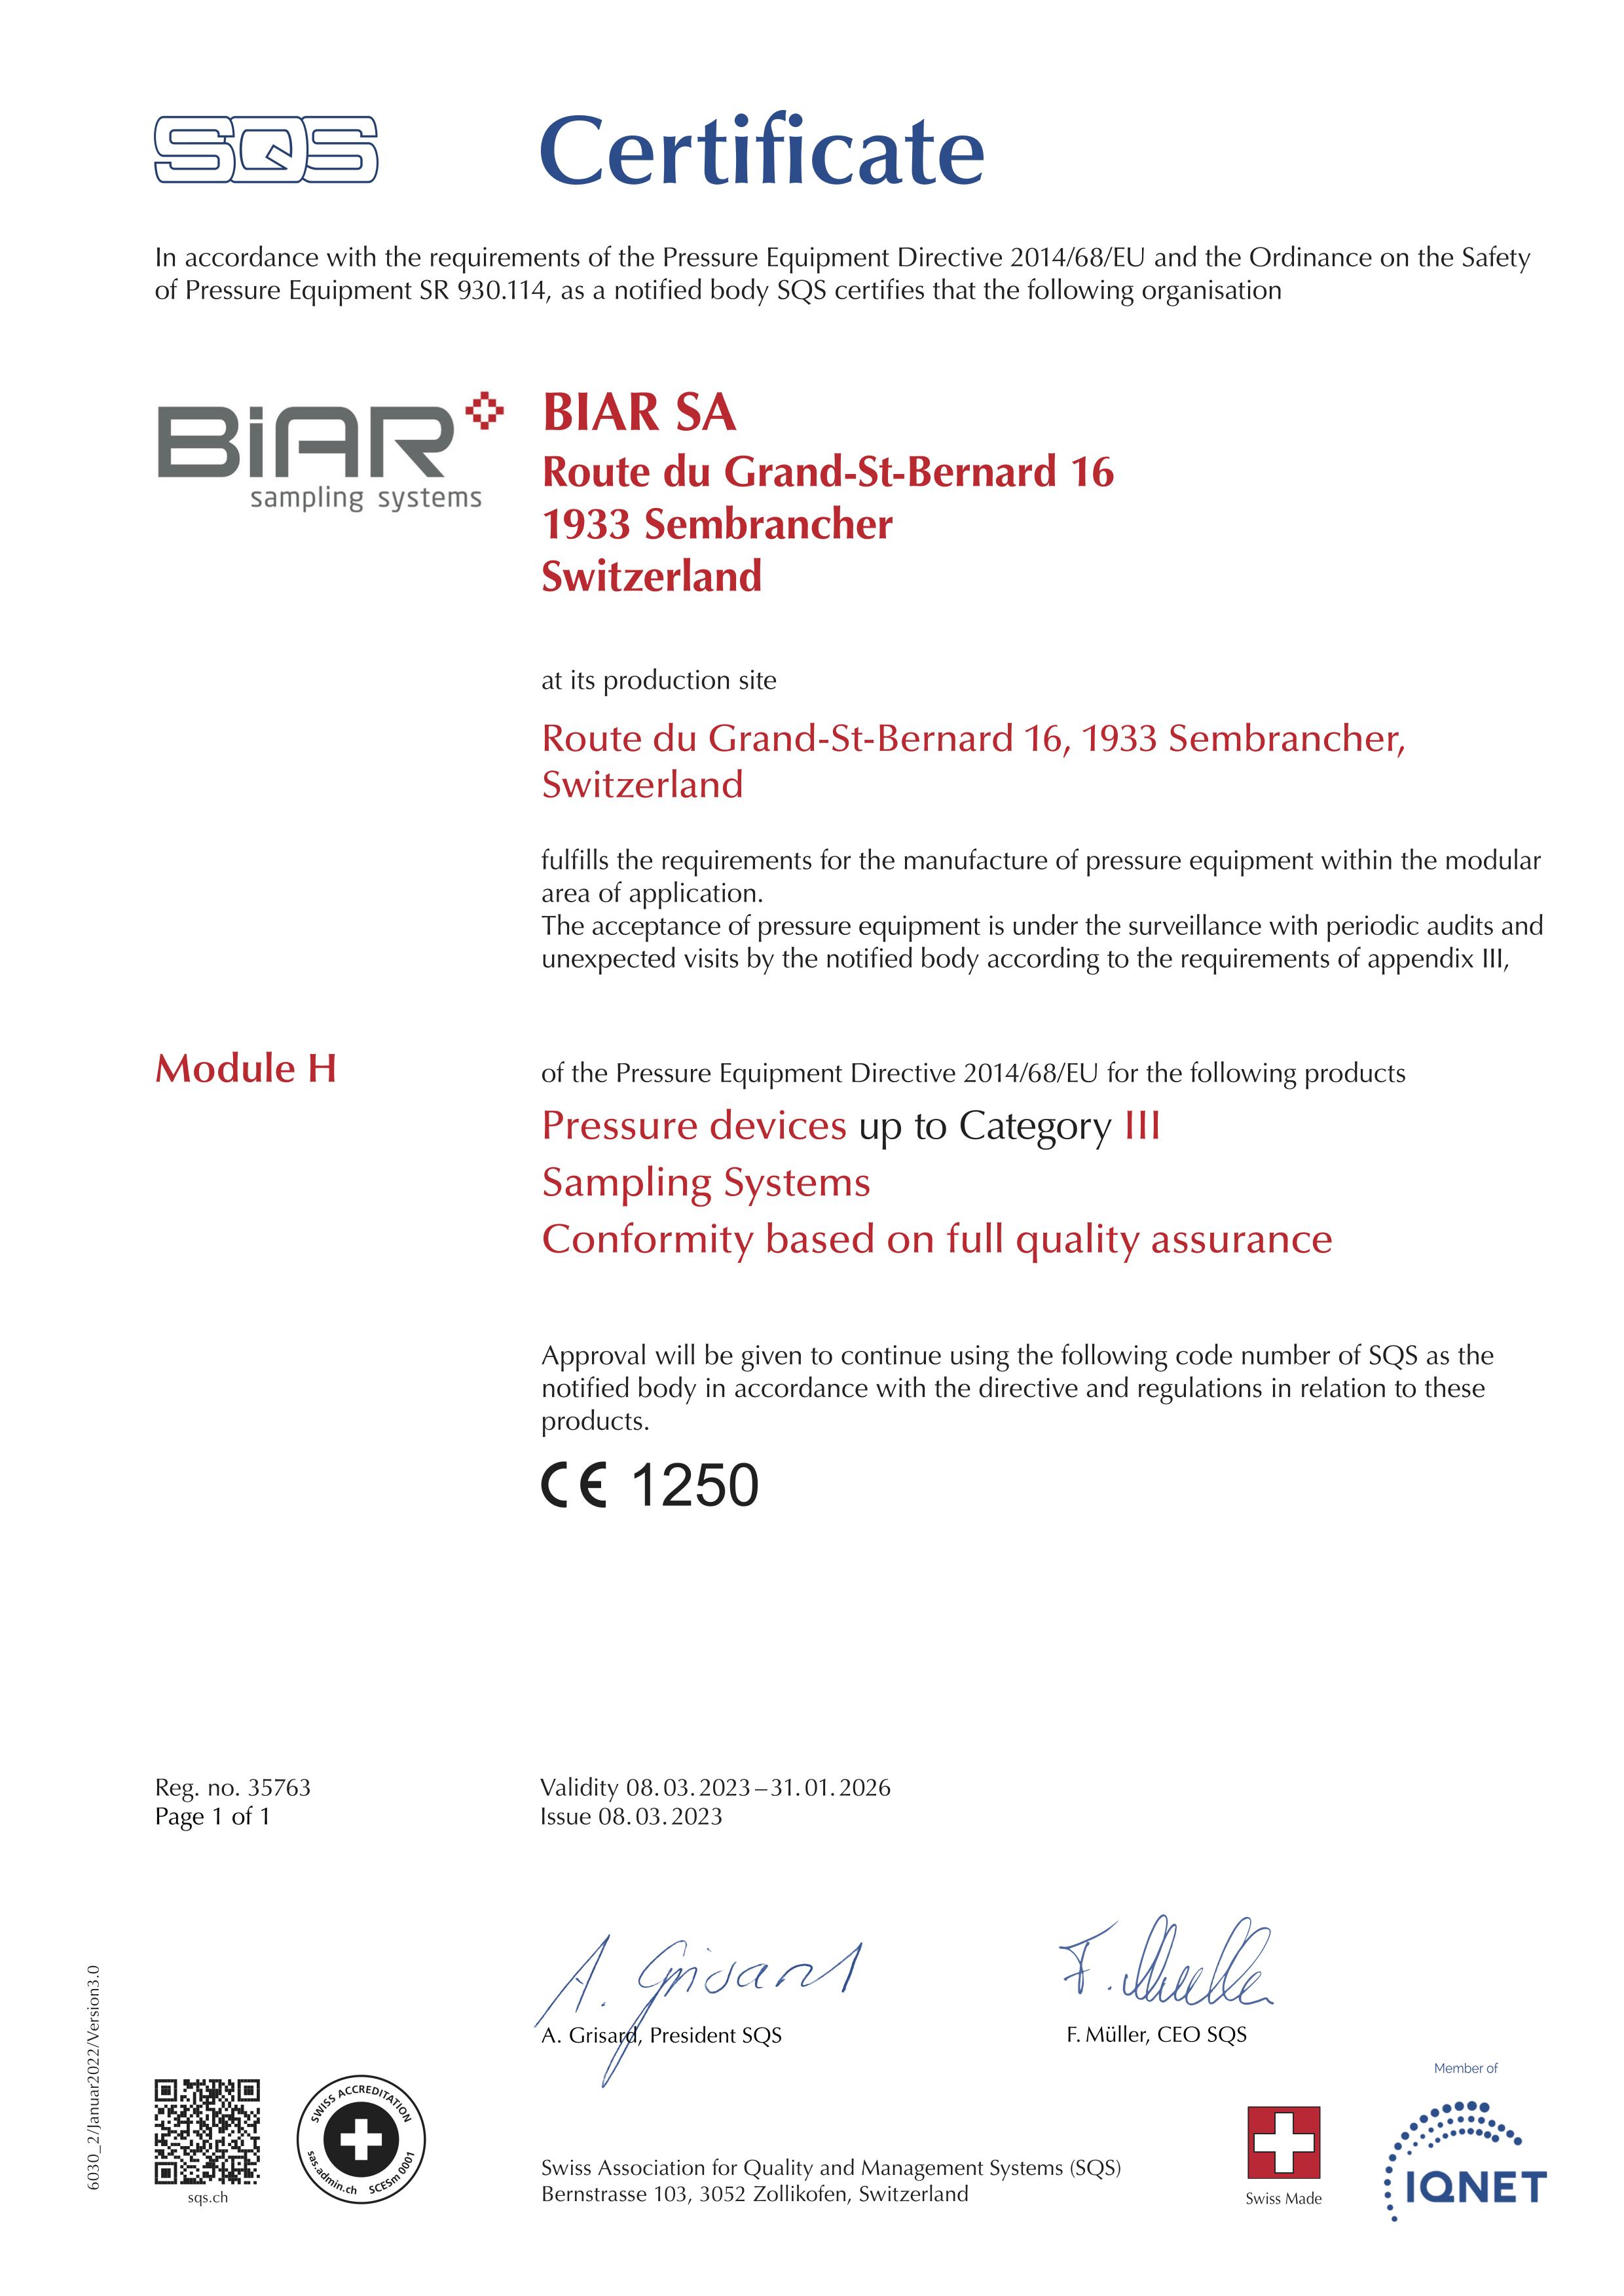 European Pressure Equipment Directive 2014.68.EU Module H